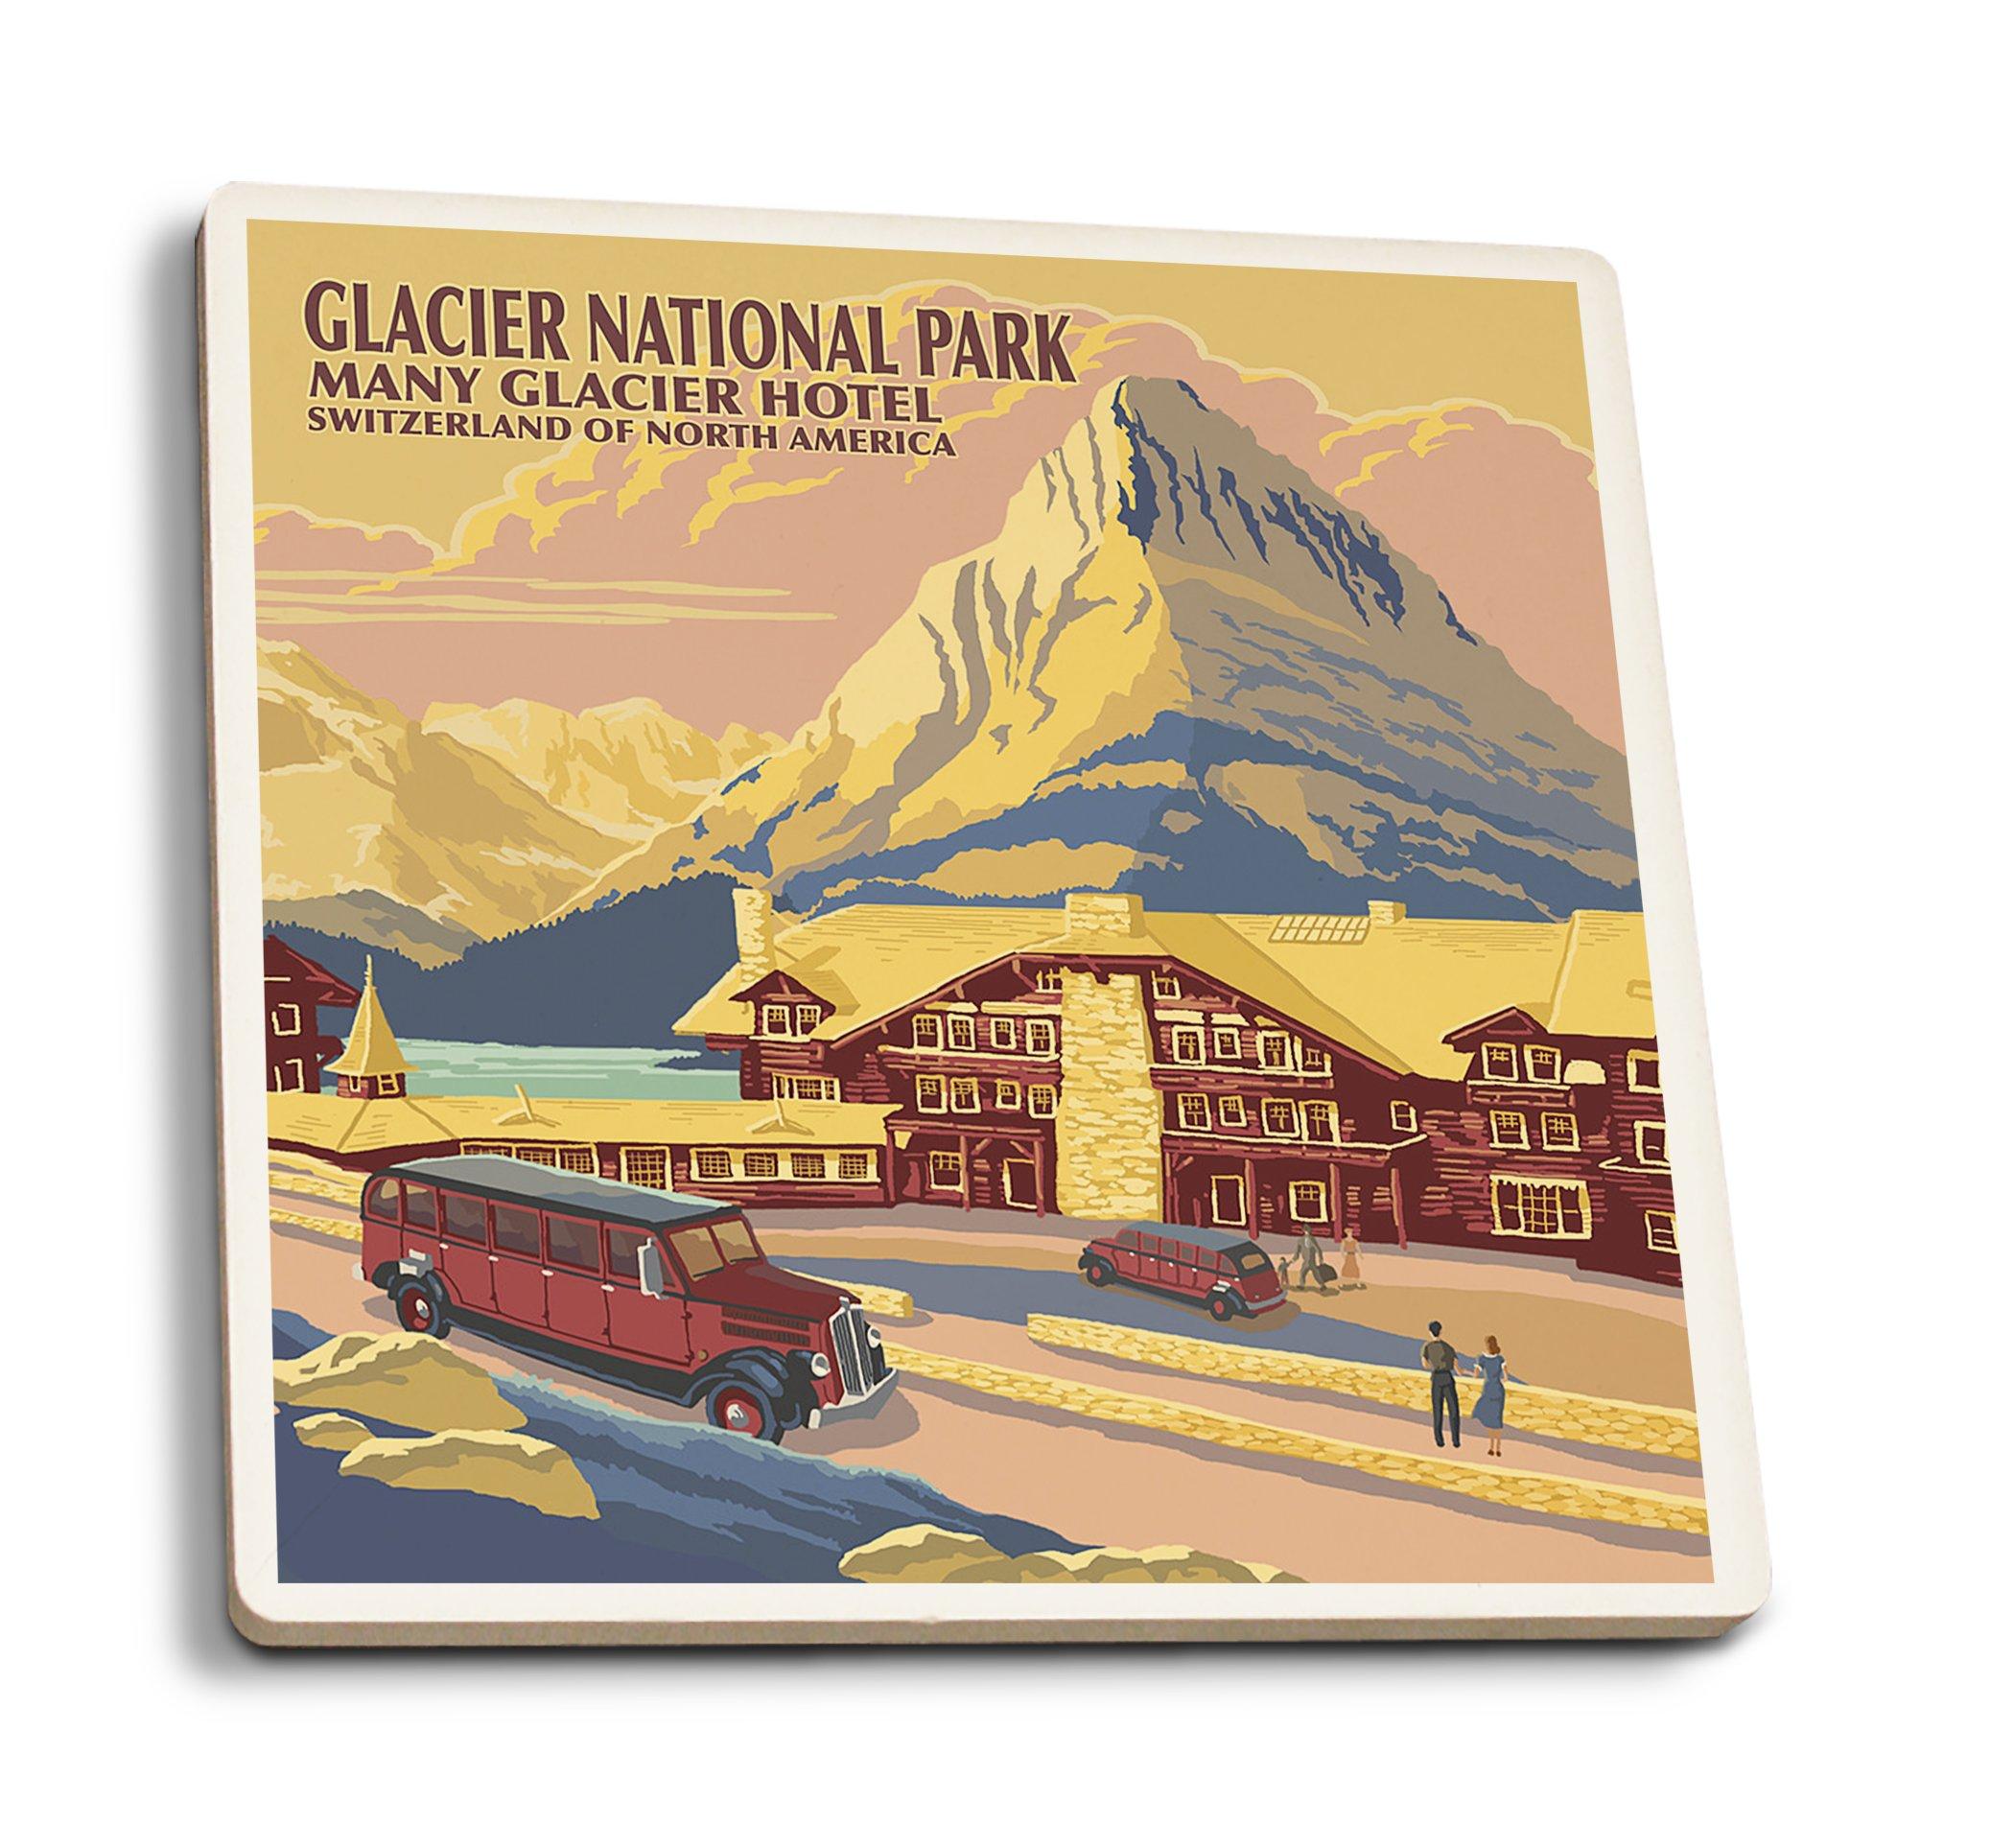 Lantern Press Glacier National Park, Montana - Many Glacier Hotel (Set of 4 Ceramic Coasters - Cork-Backed, Absorbent)